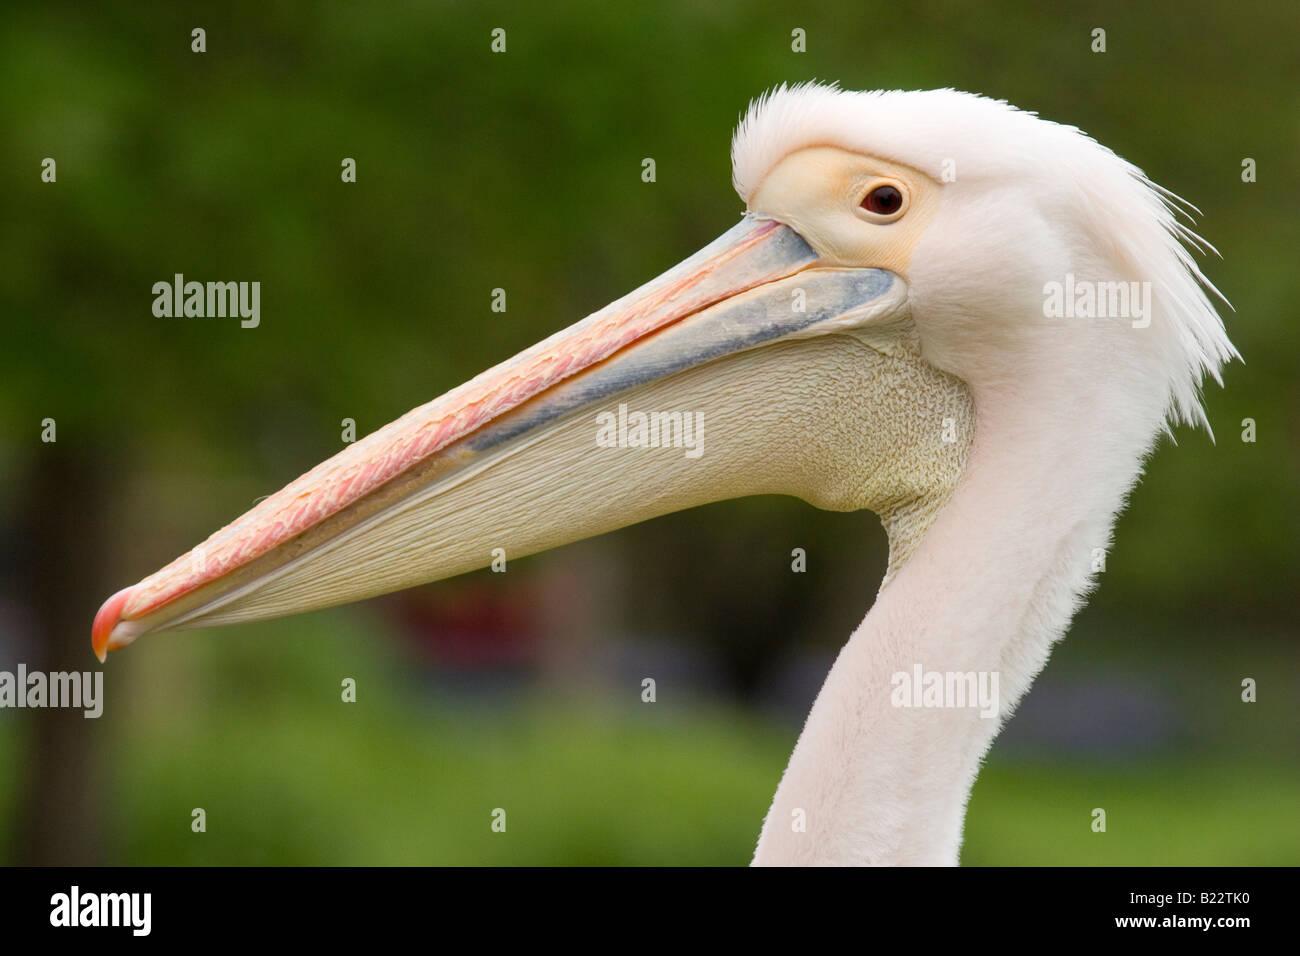 Symbolism Of The Pelican Stock Photos Symbolism Of The Pelican